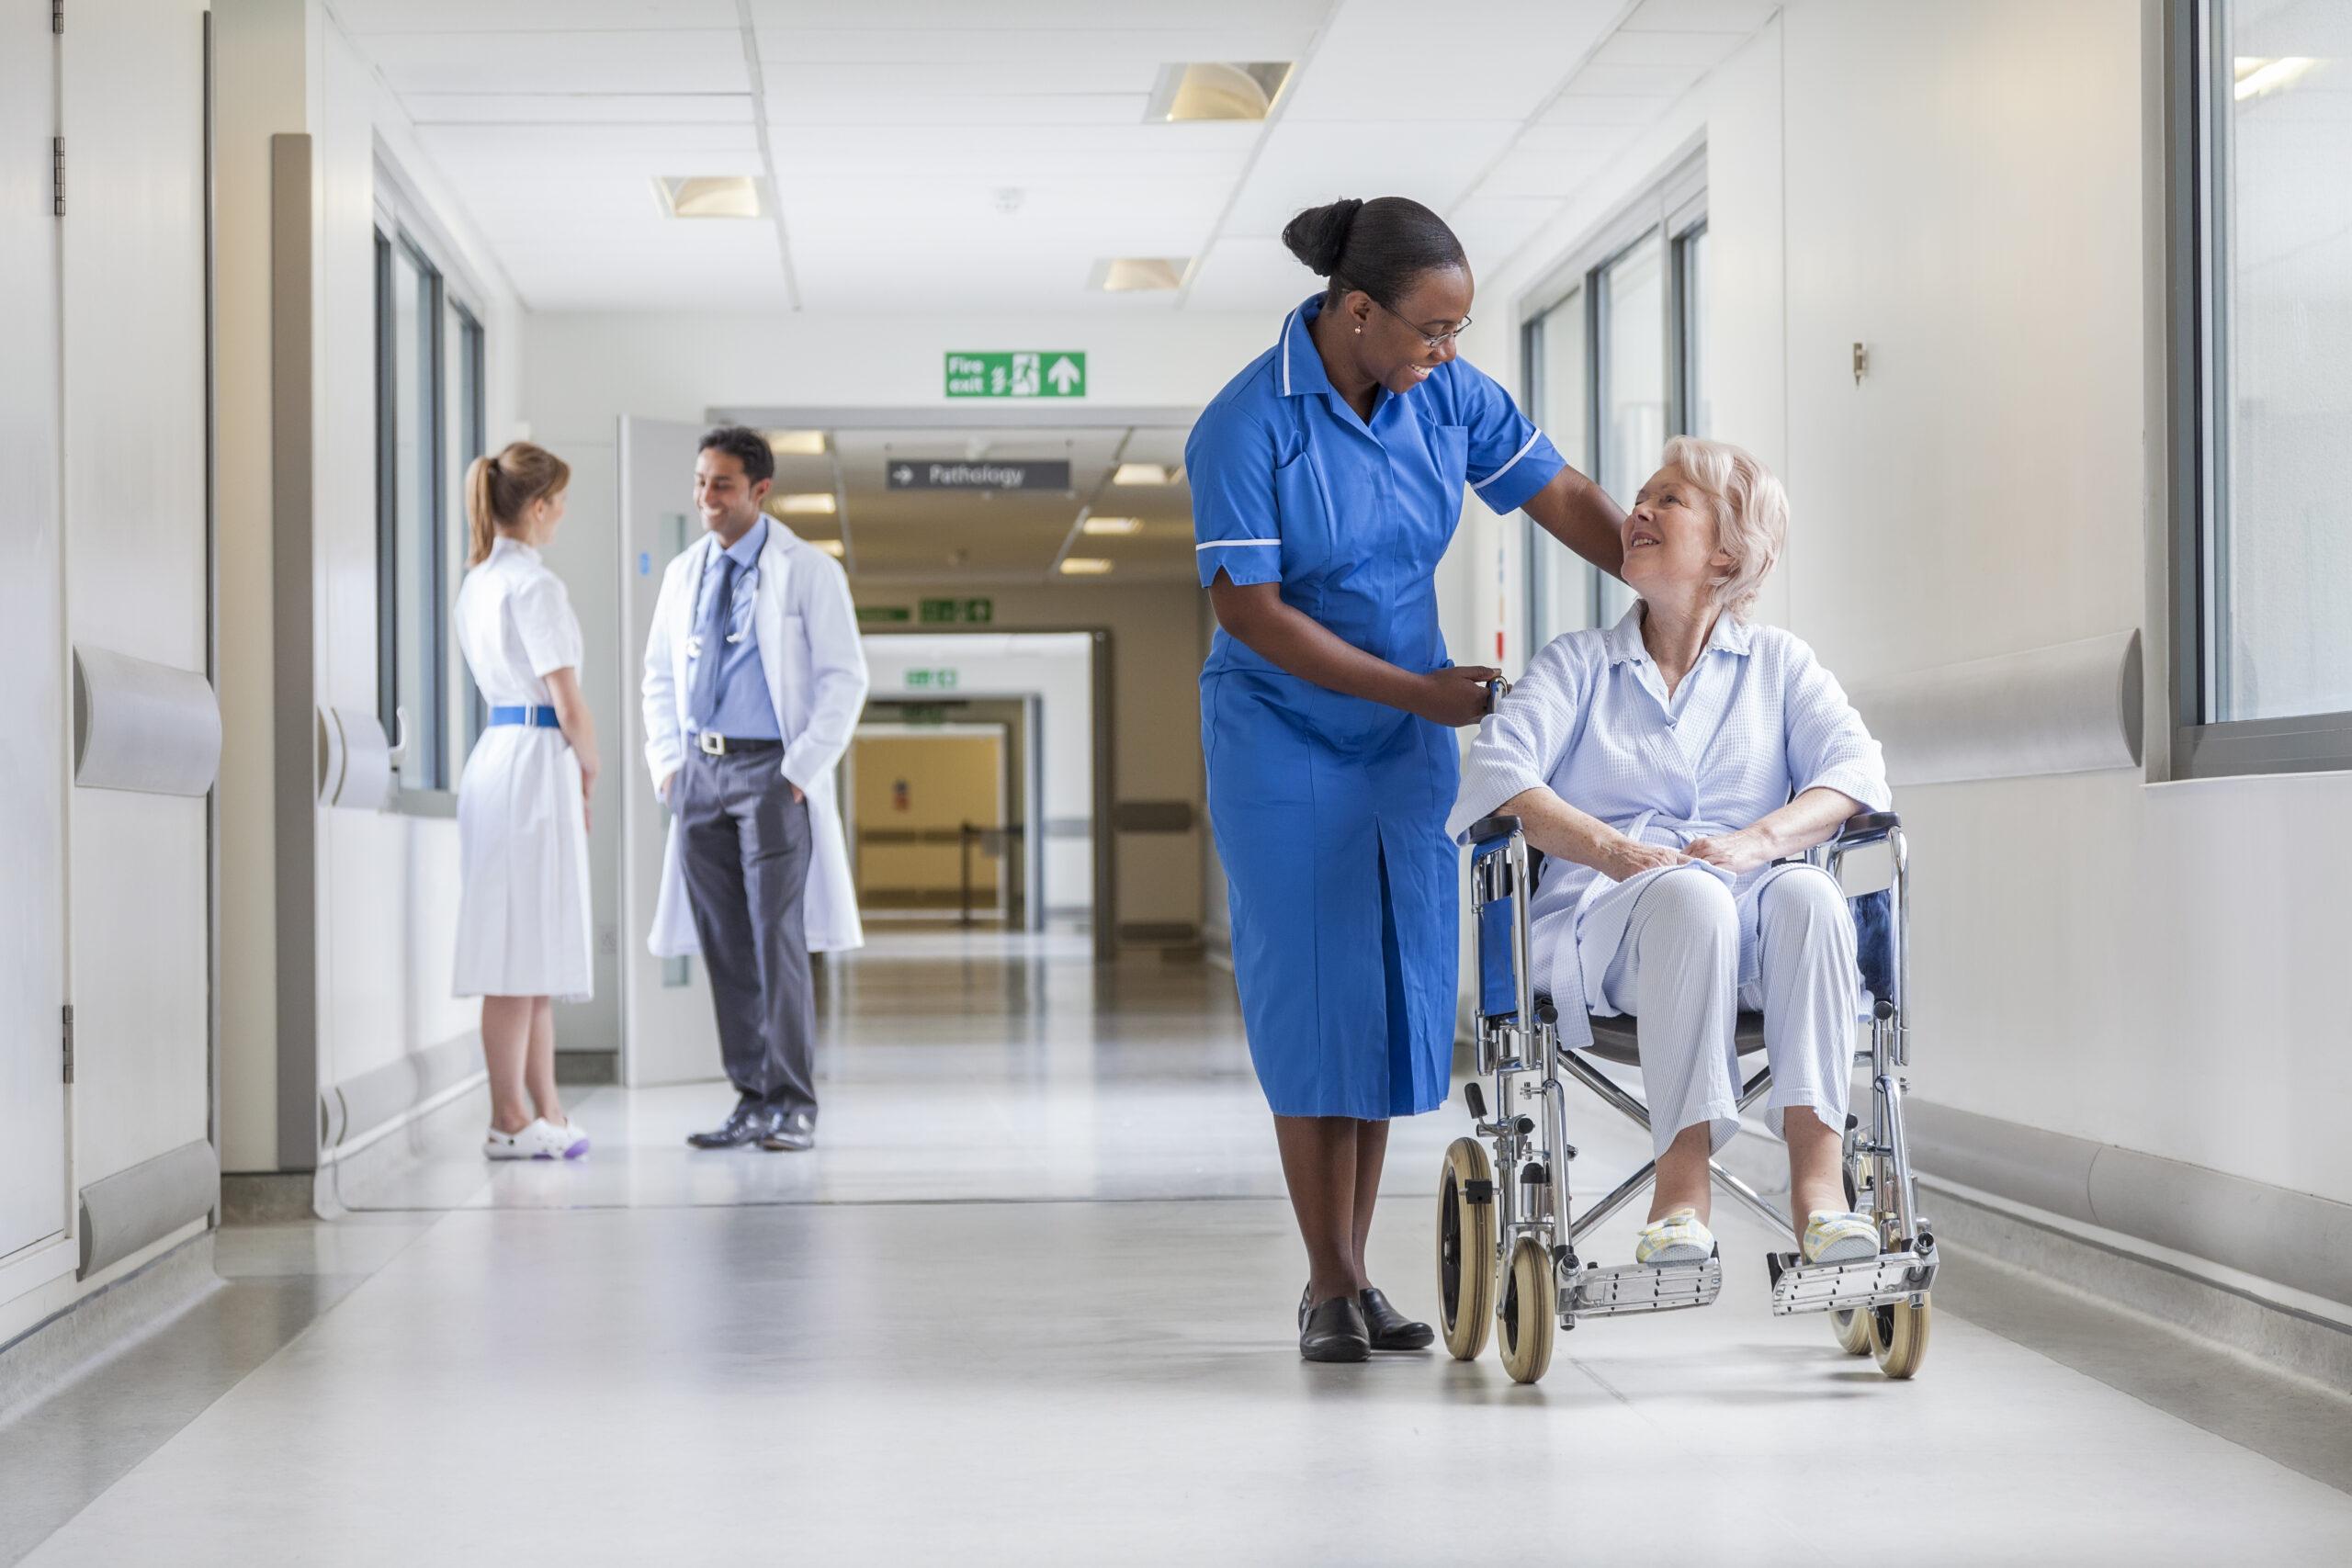 Female patient in wheelchair with nurse